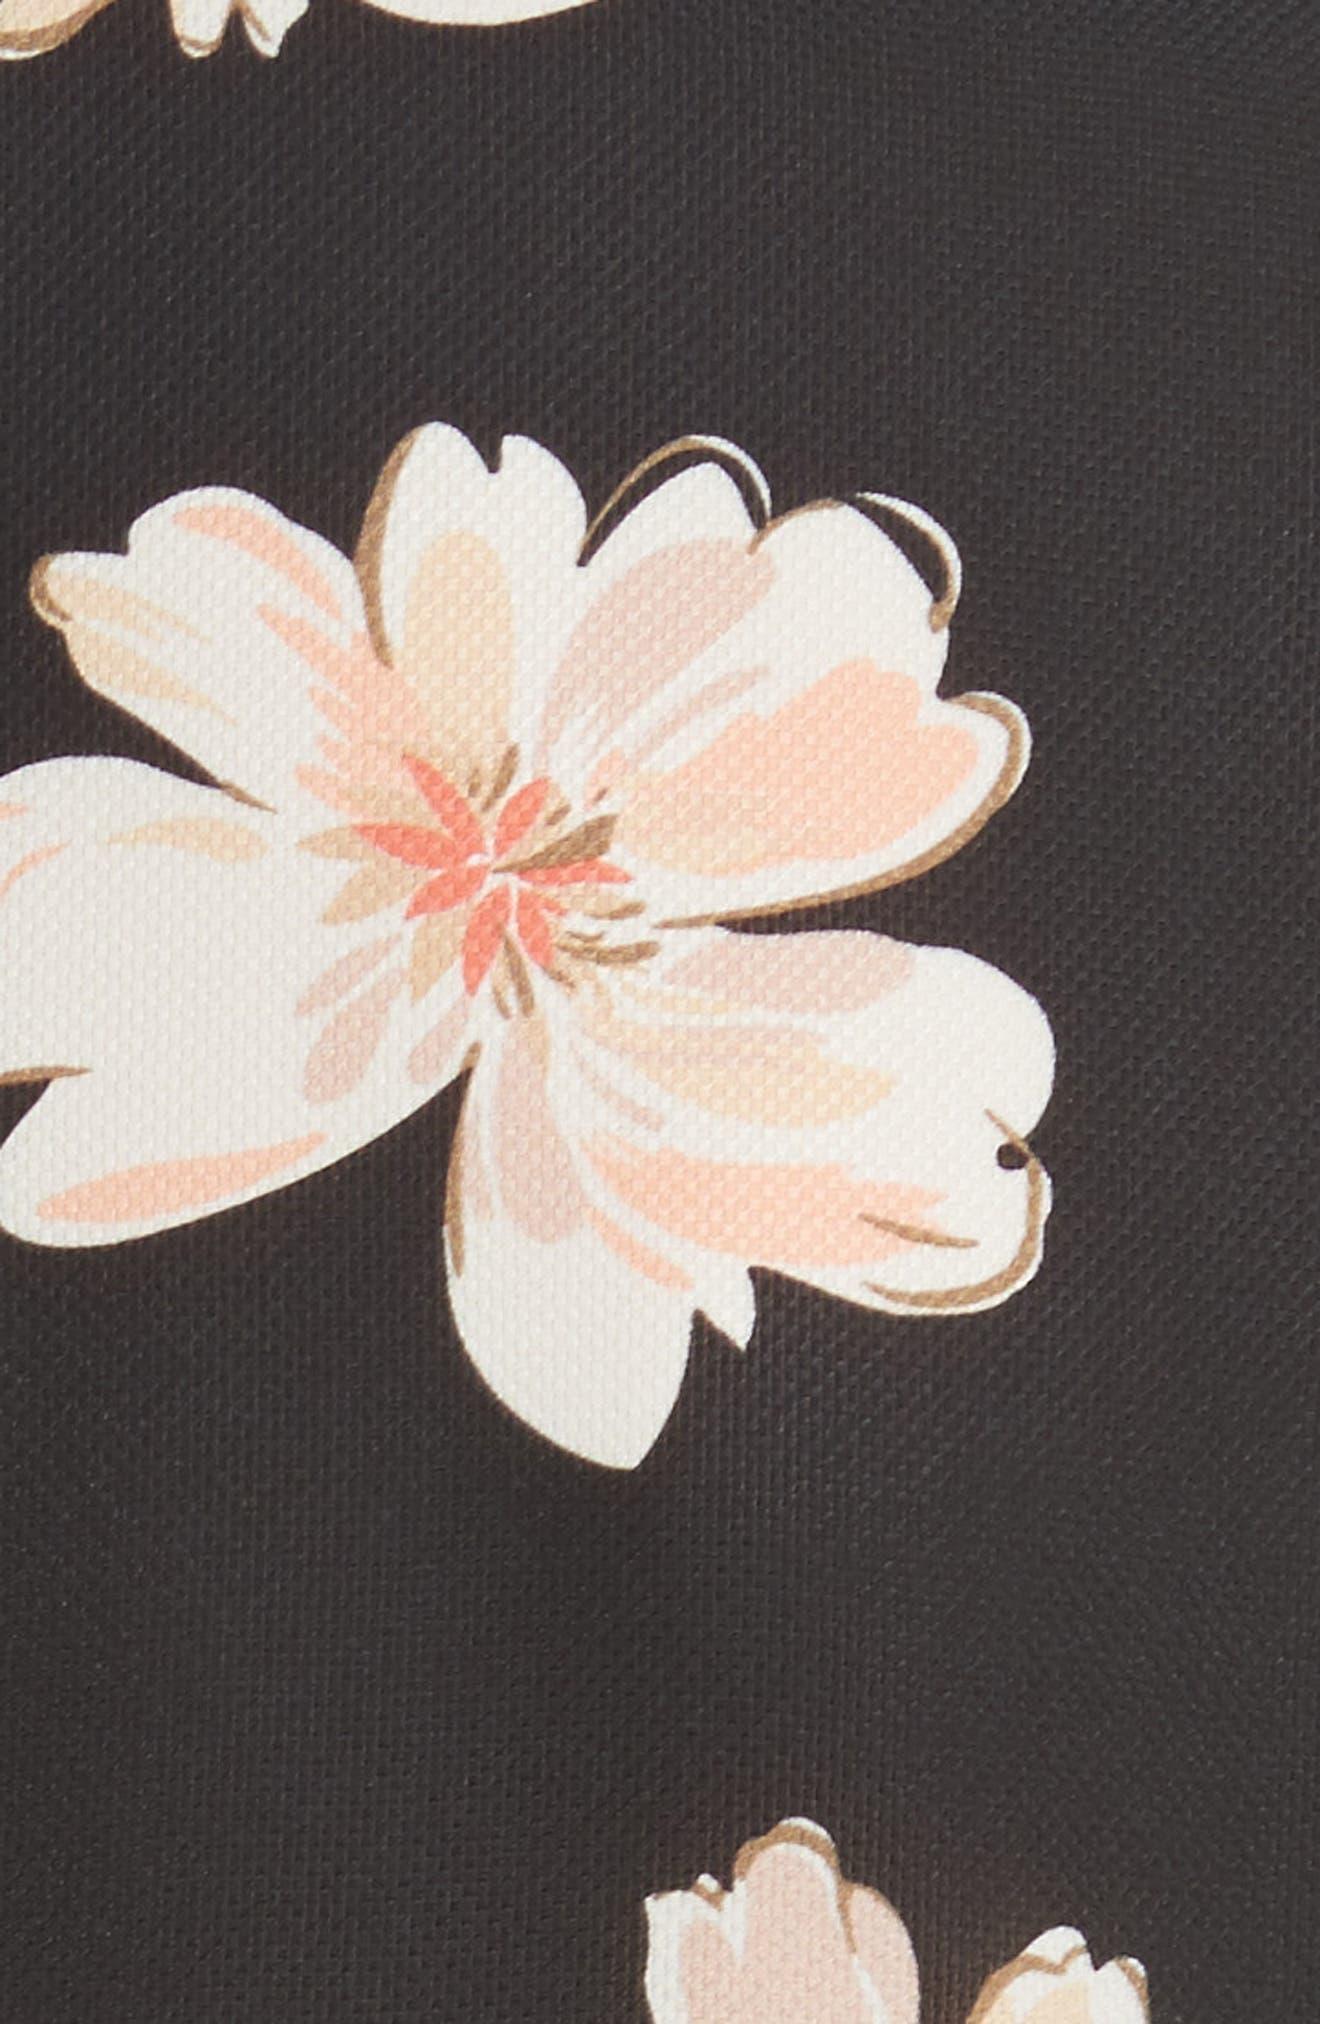 Arka Winterfloral Belted Midi Dress,                             Alternate thumbnail 5, color,                             005